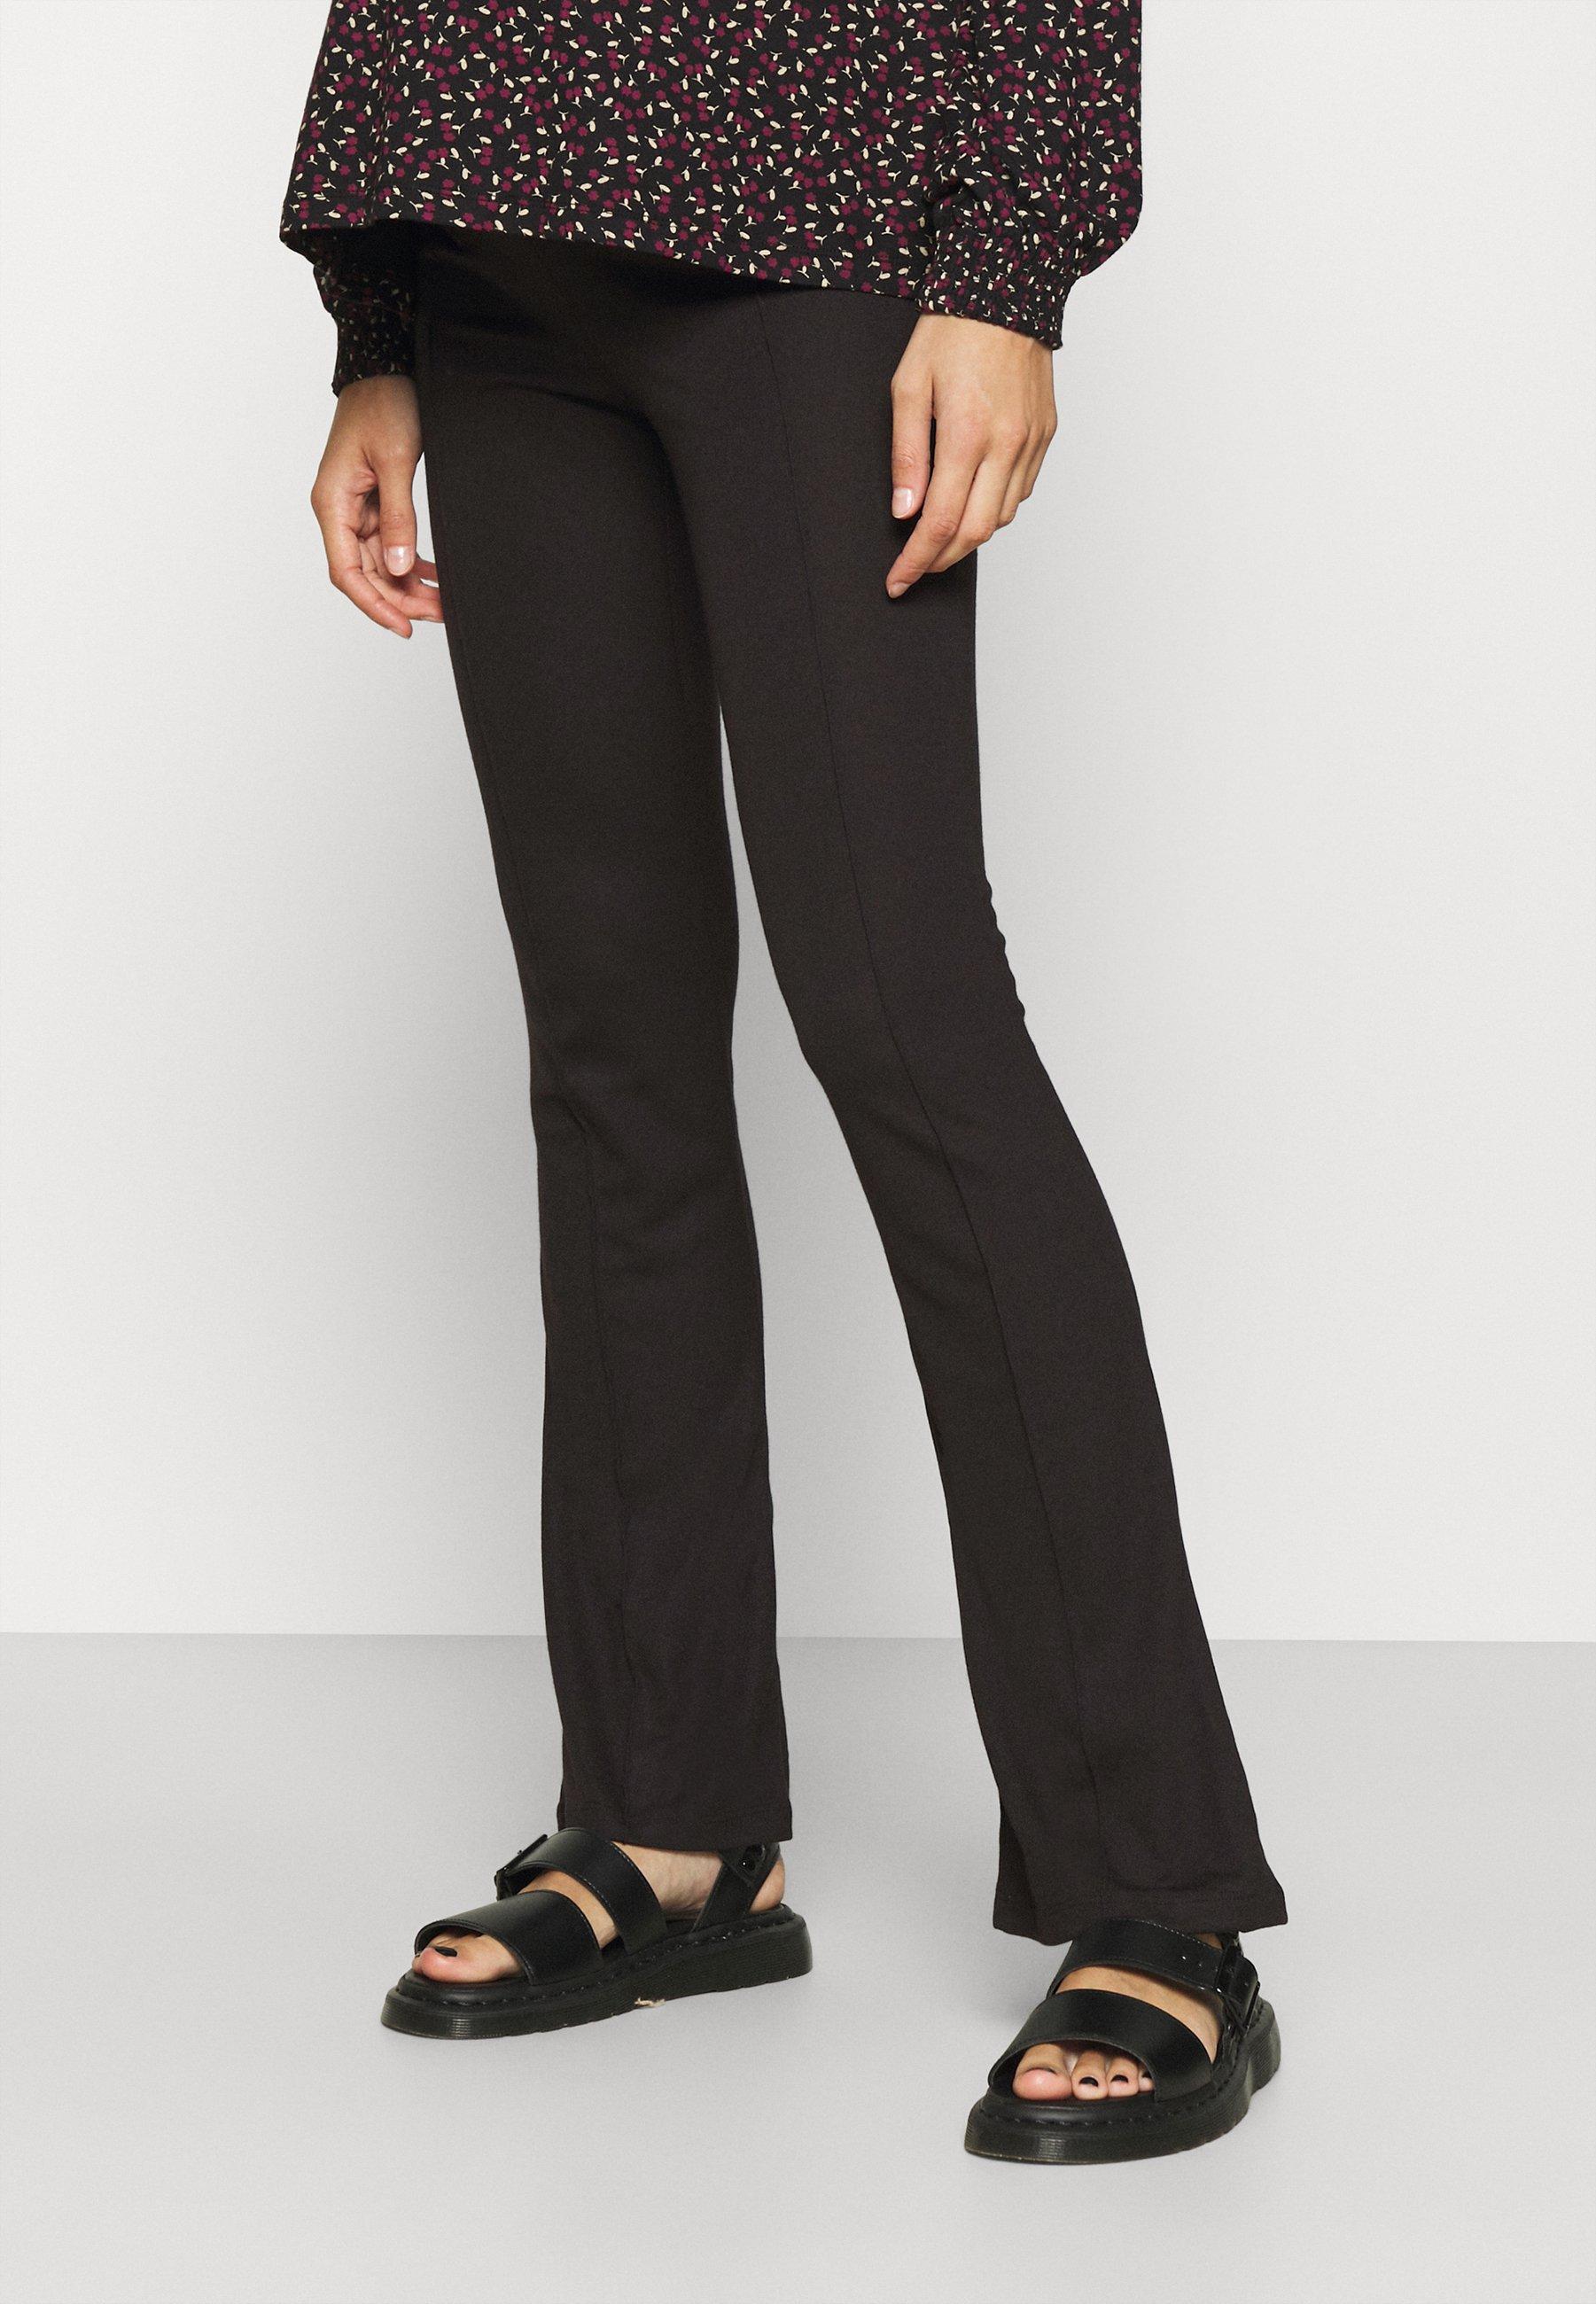 Femme MLLUNA PINTUC FLARED PANT - Pantalon classique